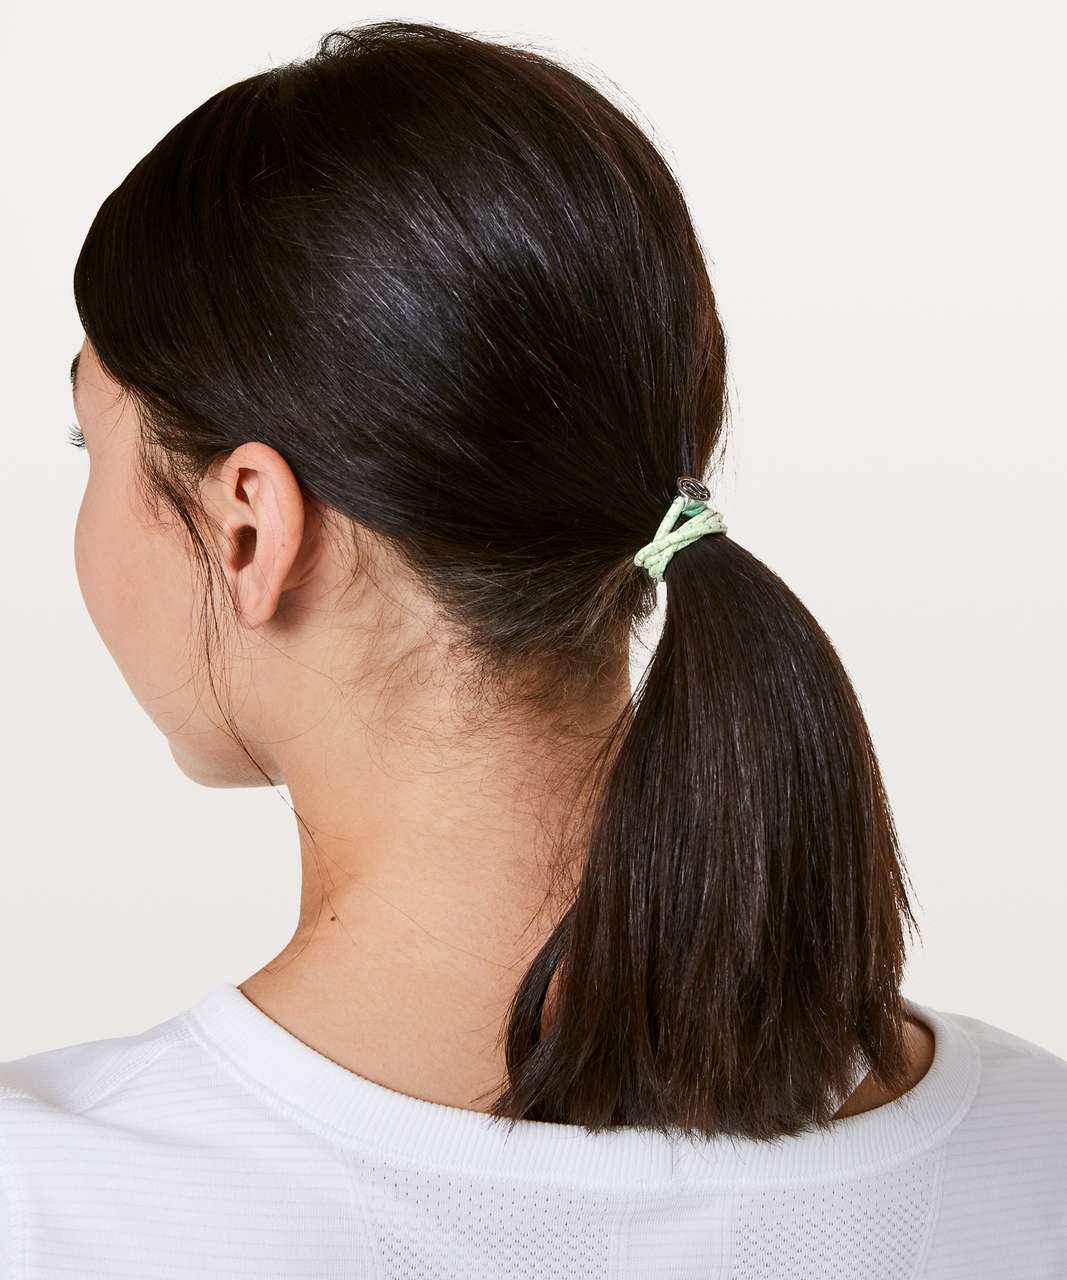 Lululemon Glow On Hair Ties - Toothpaste / Bali Breeze / Citra Lime